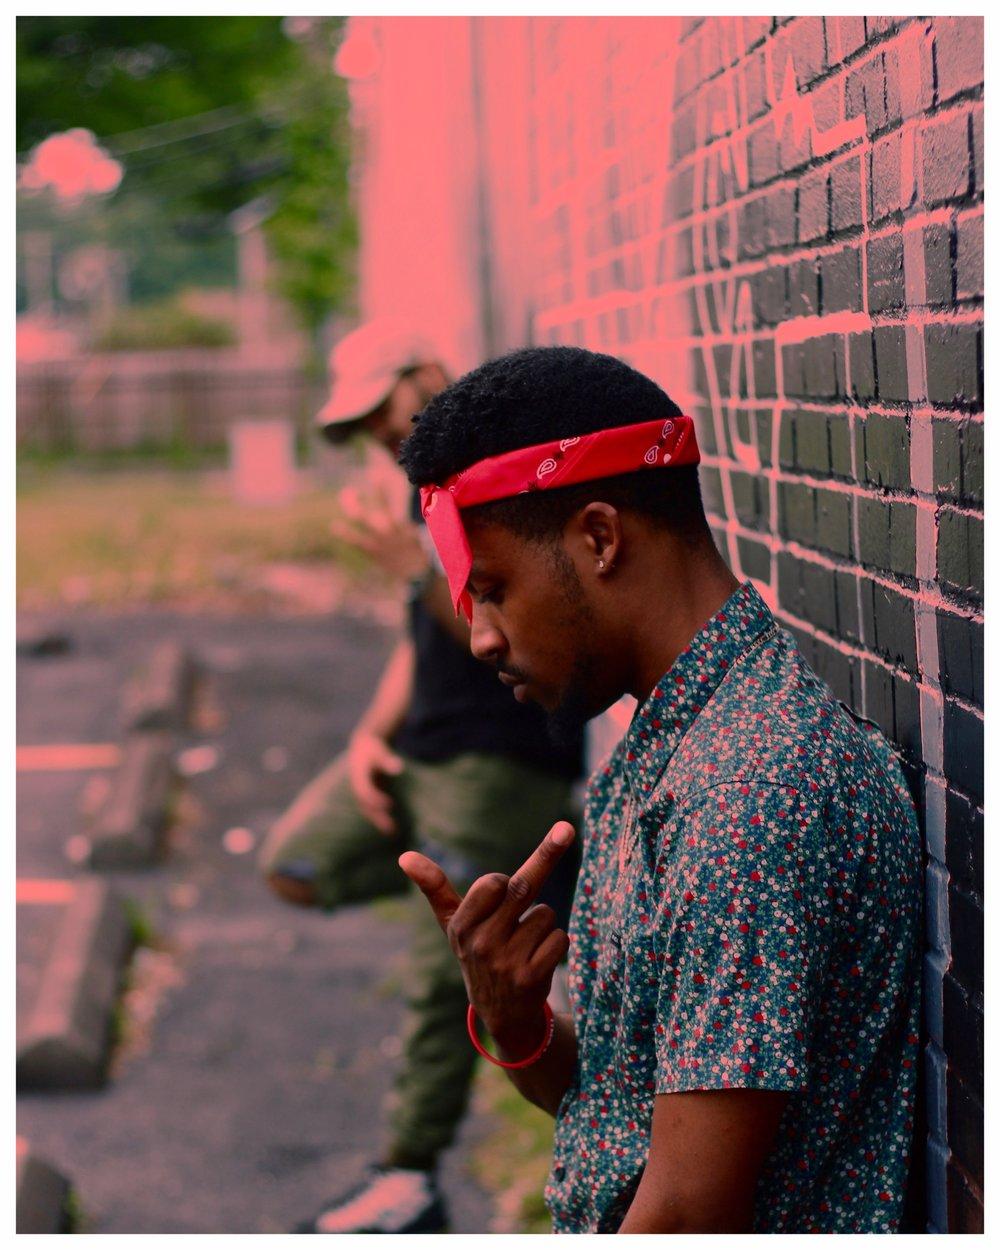 Dwayne+Levi+Profile+Shot.jpeg